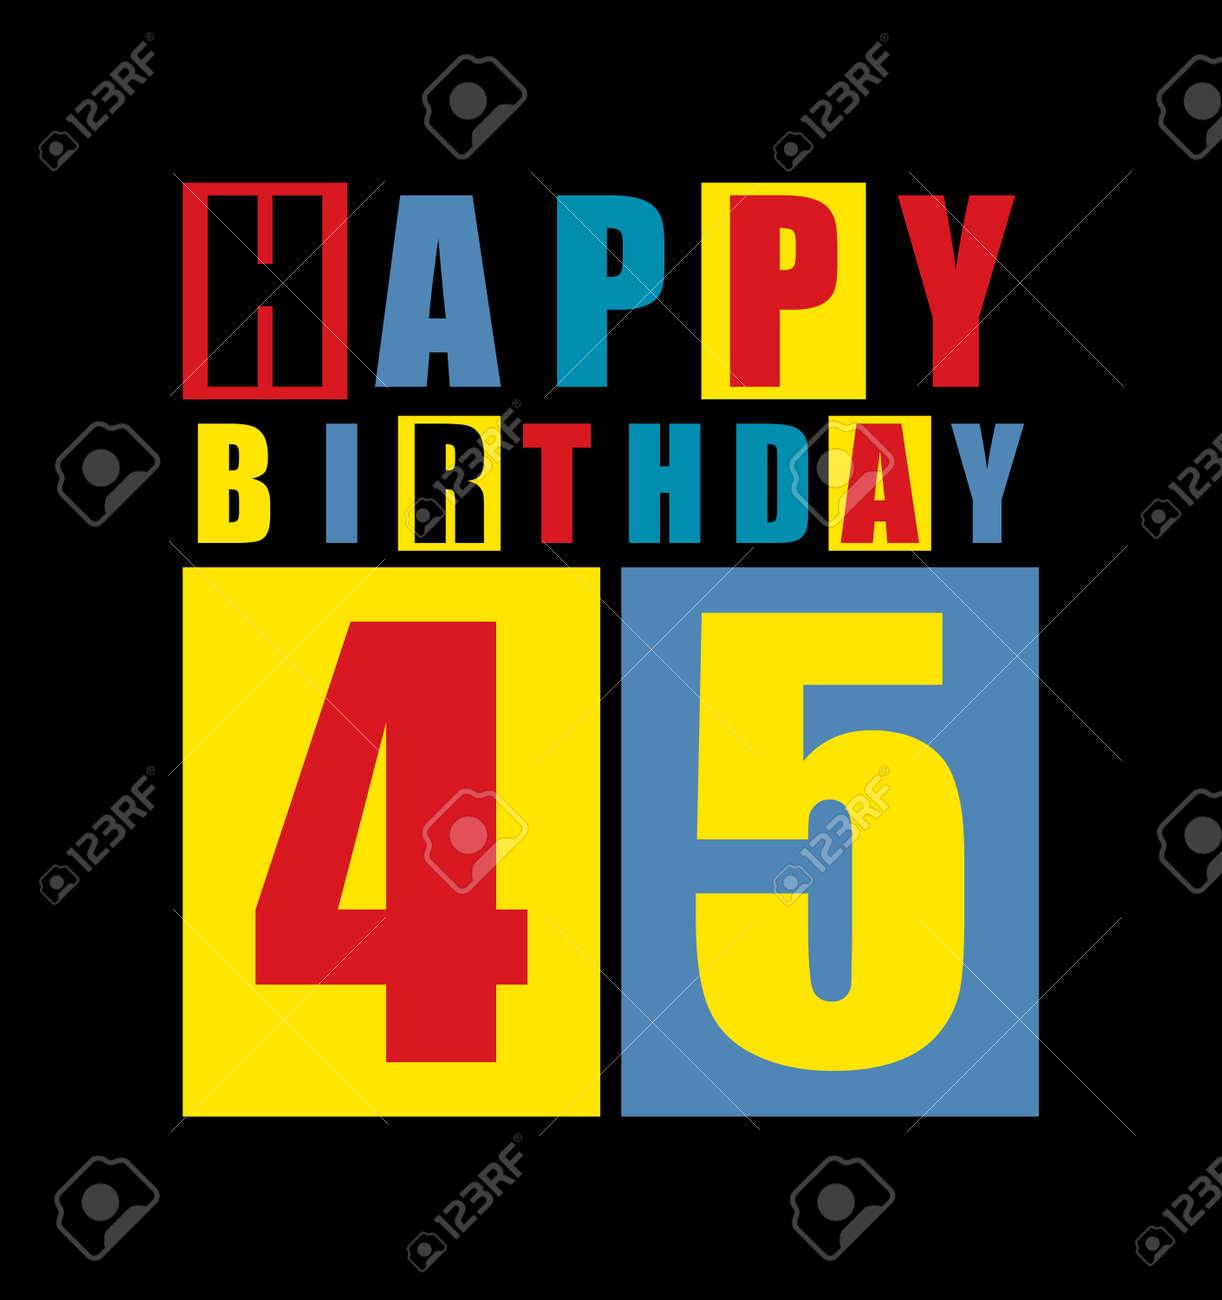 Retro Happy Birthday Card 45 Years Gift Vector Illustration Stock